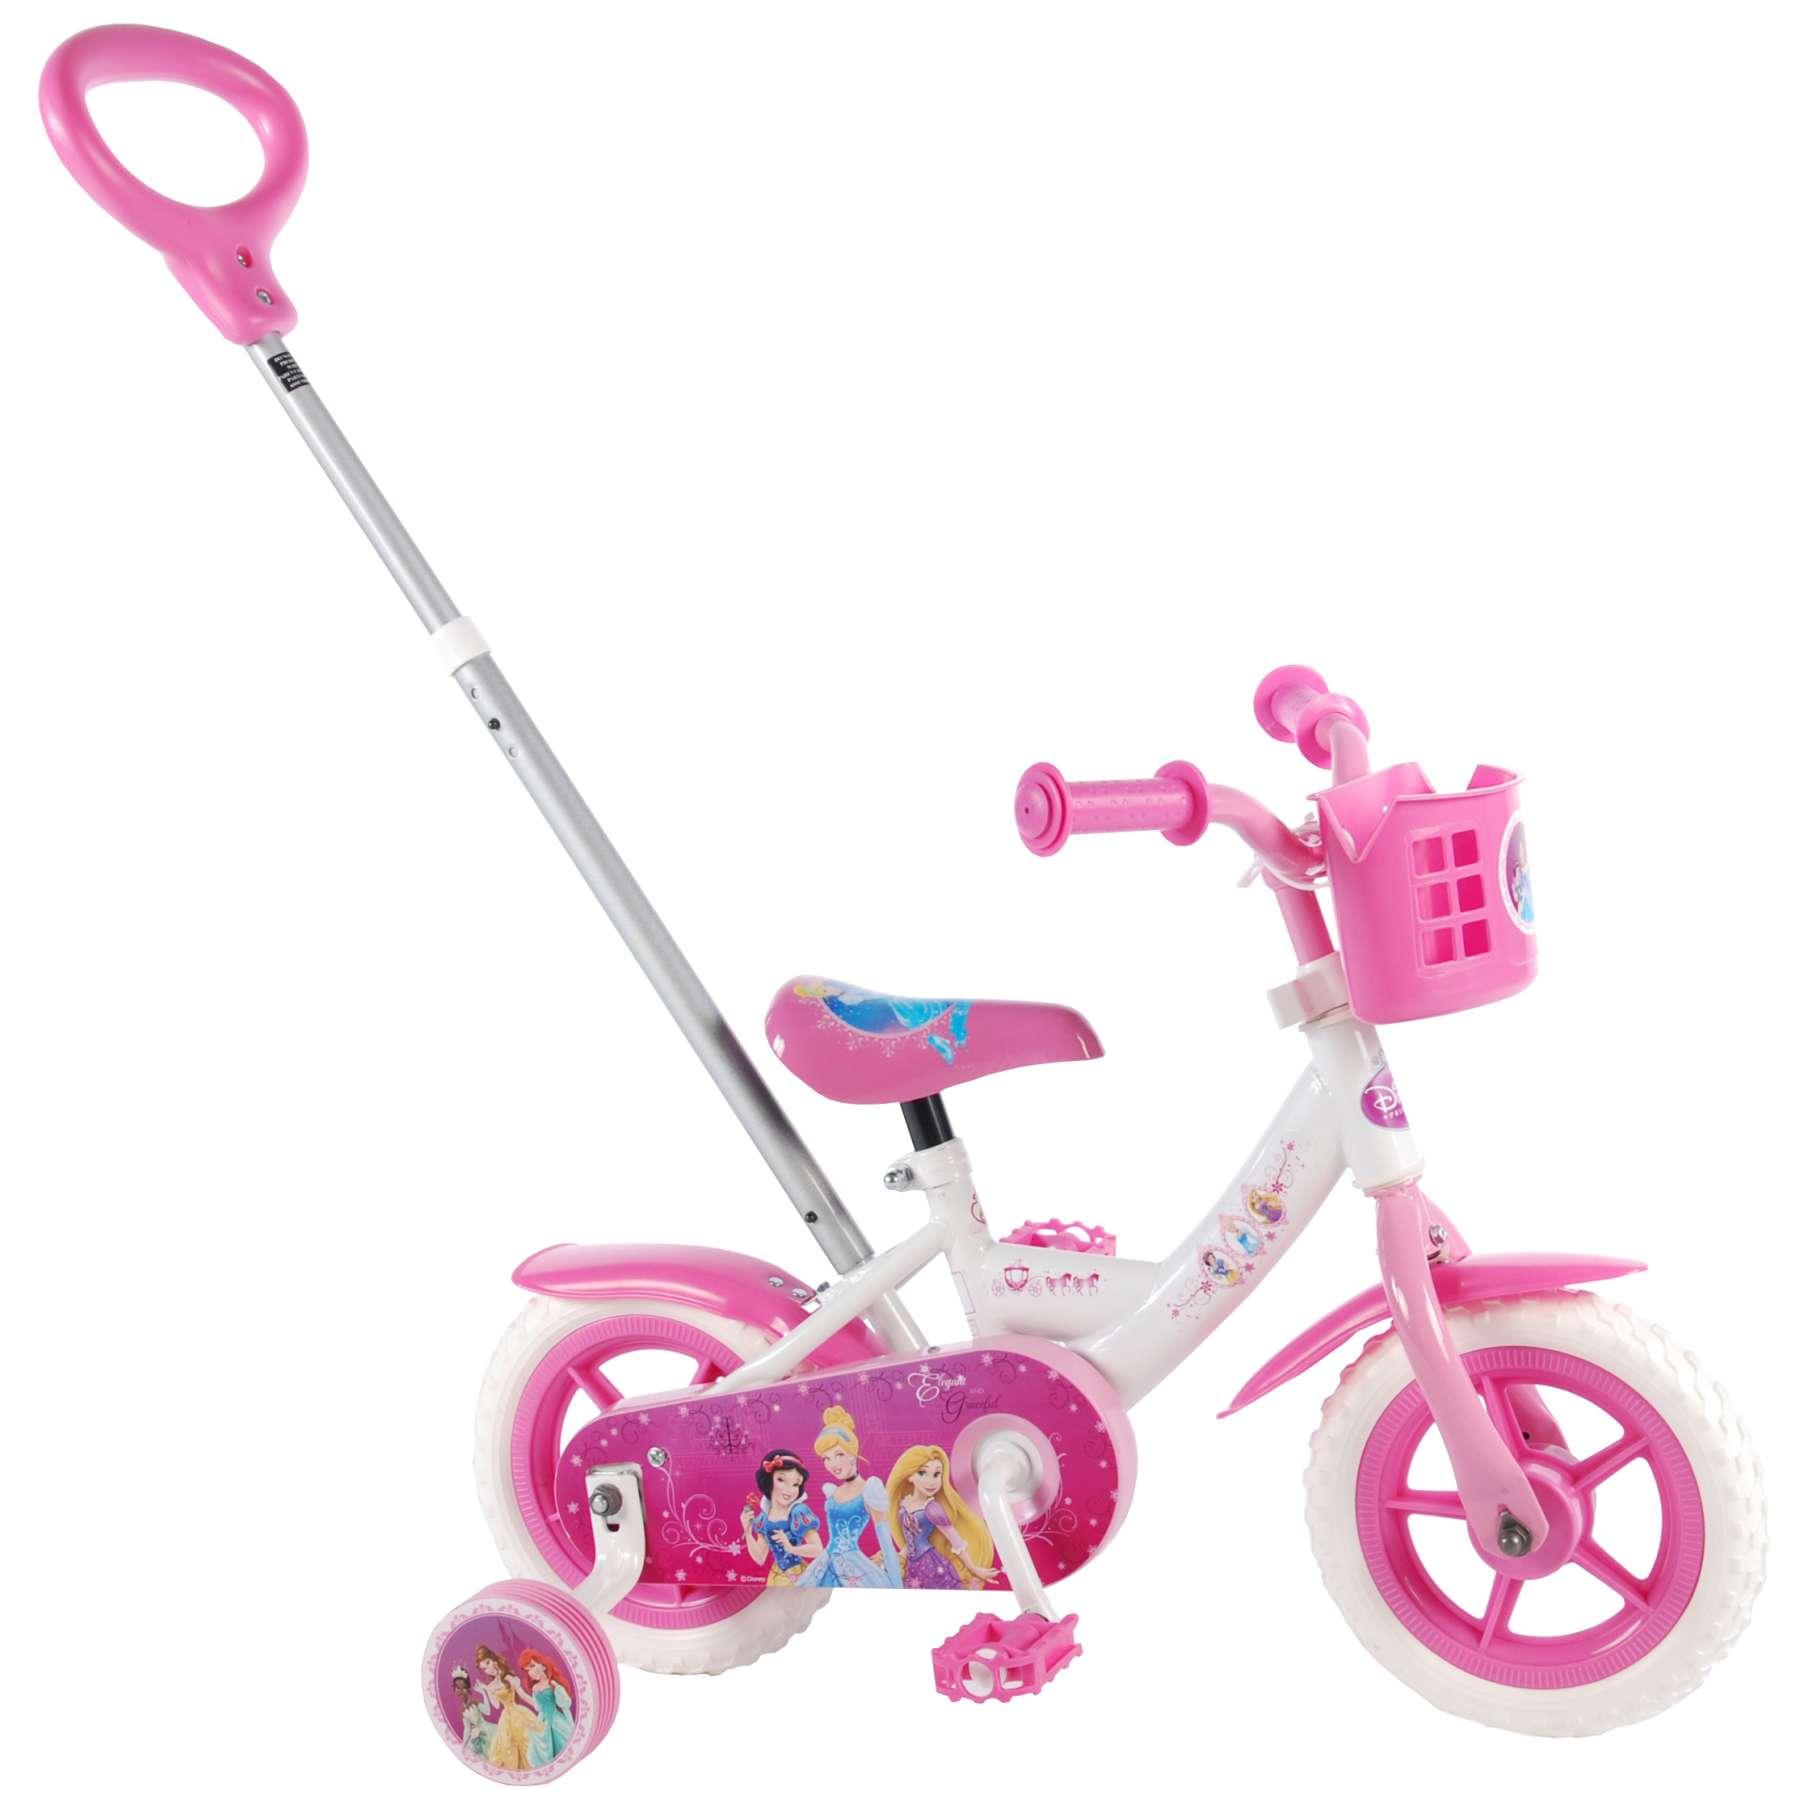 disney princess 10 inch girls bicycle. Black Bedroom Furniture Sets. Home Design Ideas